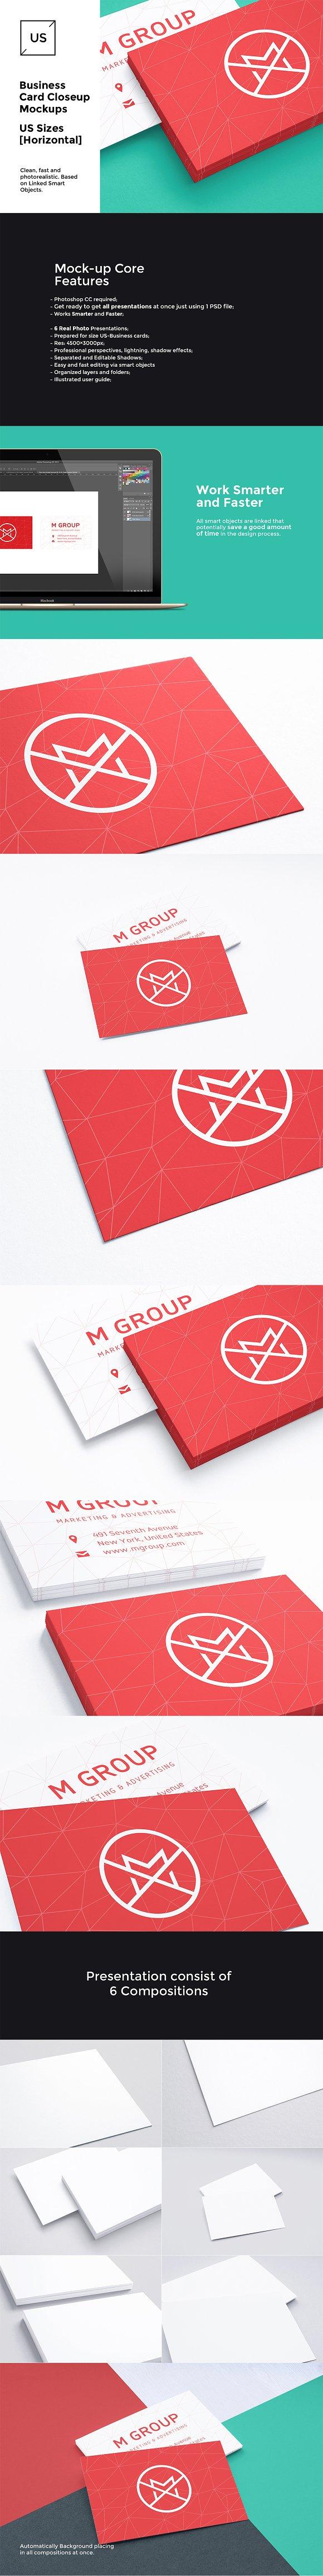 US Business Cards Mockups [close-up]